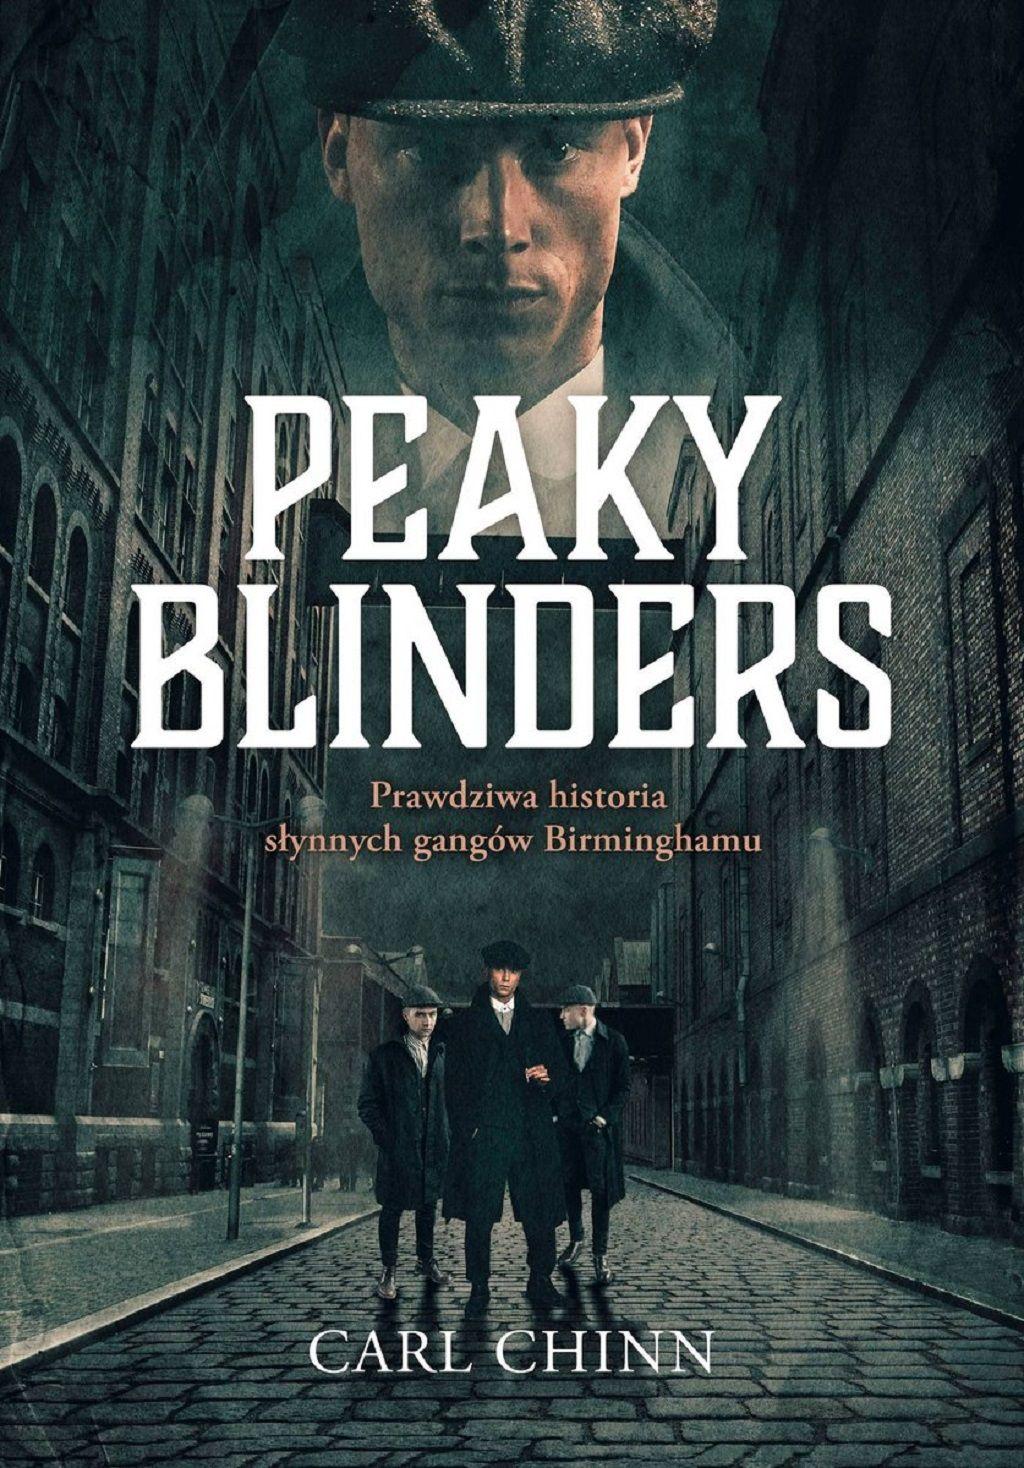 Carl Chinn – Peaky Blinders. Prawdziwa historia słynnych gangów Birminghamu